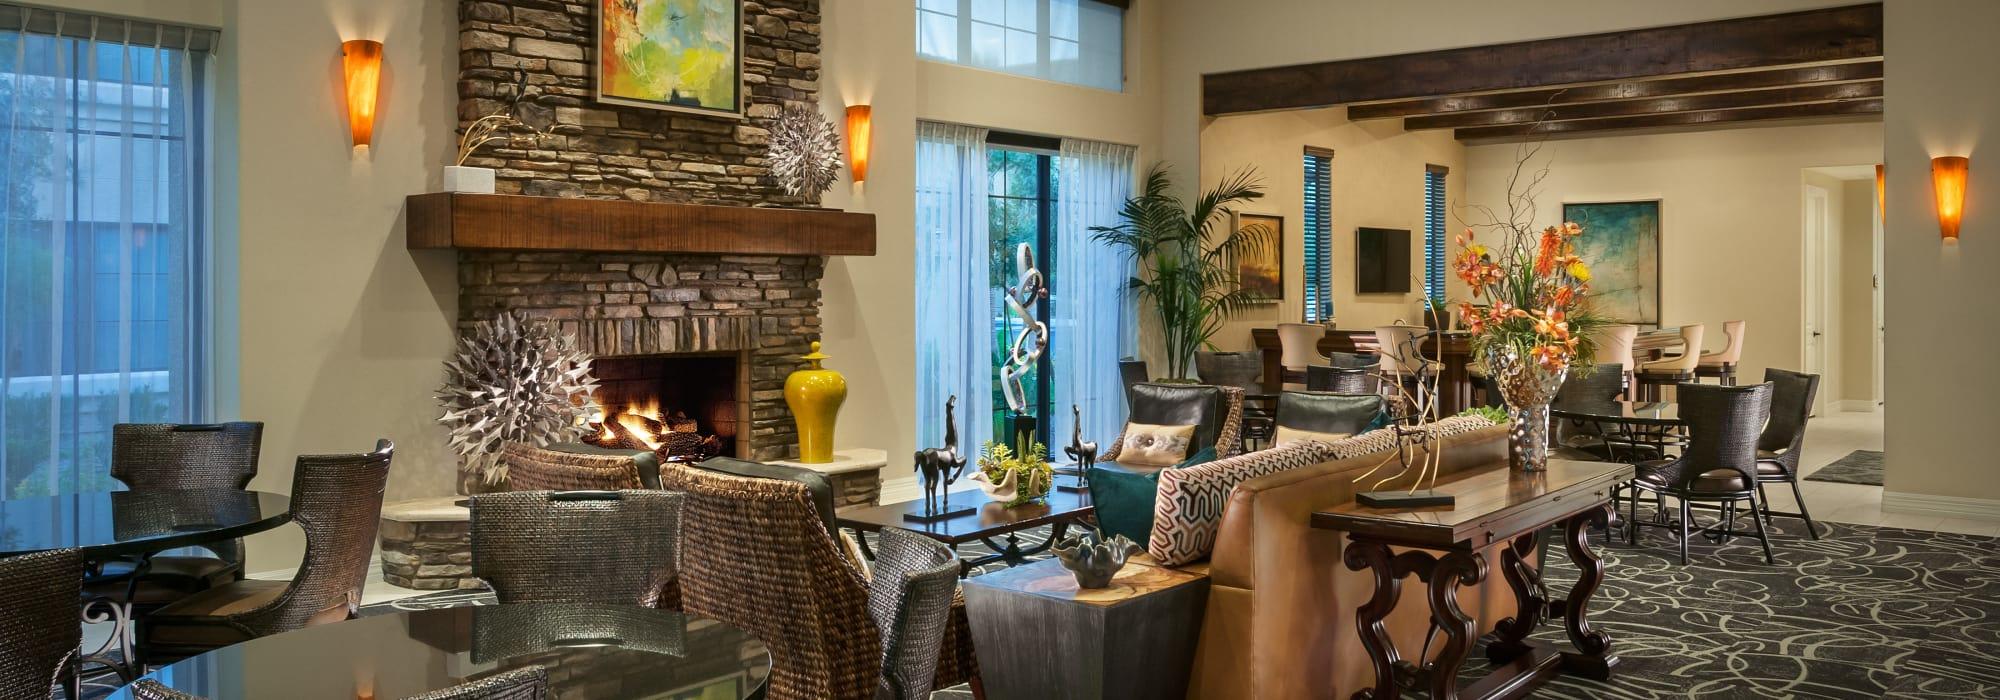 Interior of the lavish resident clubhouse at San Milan in Phoenix, Arizona